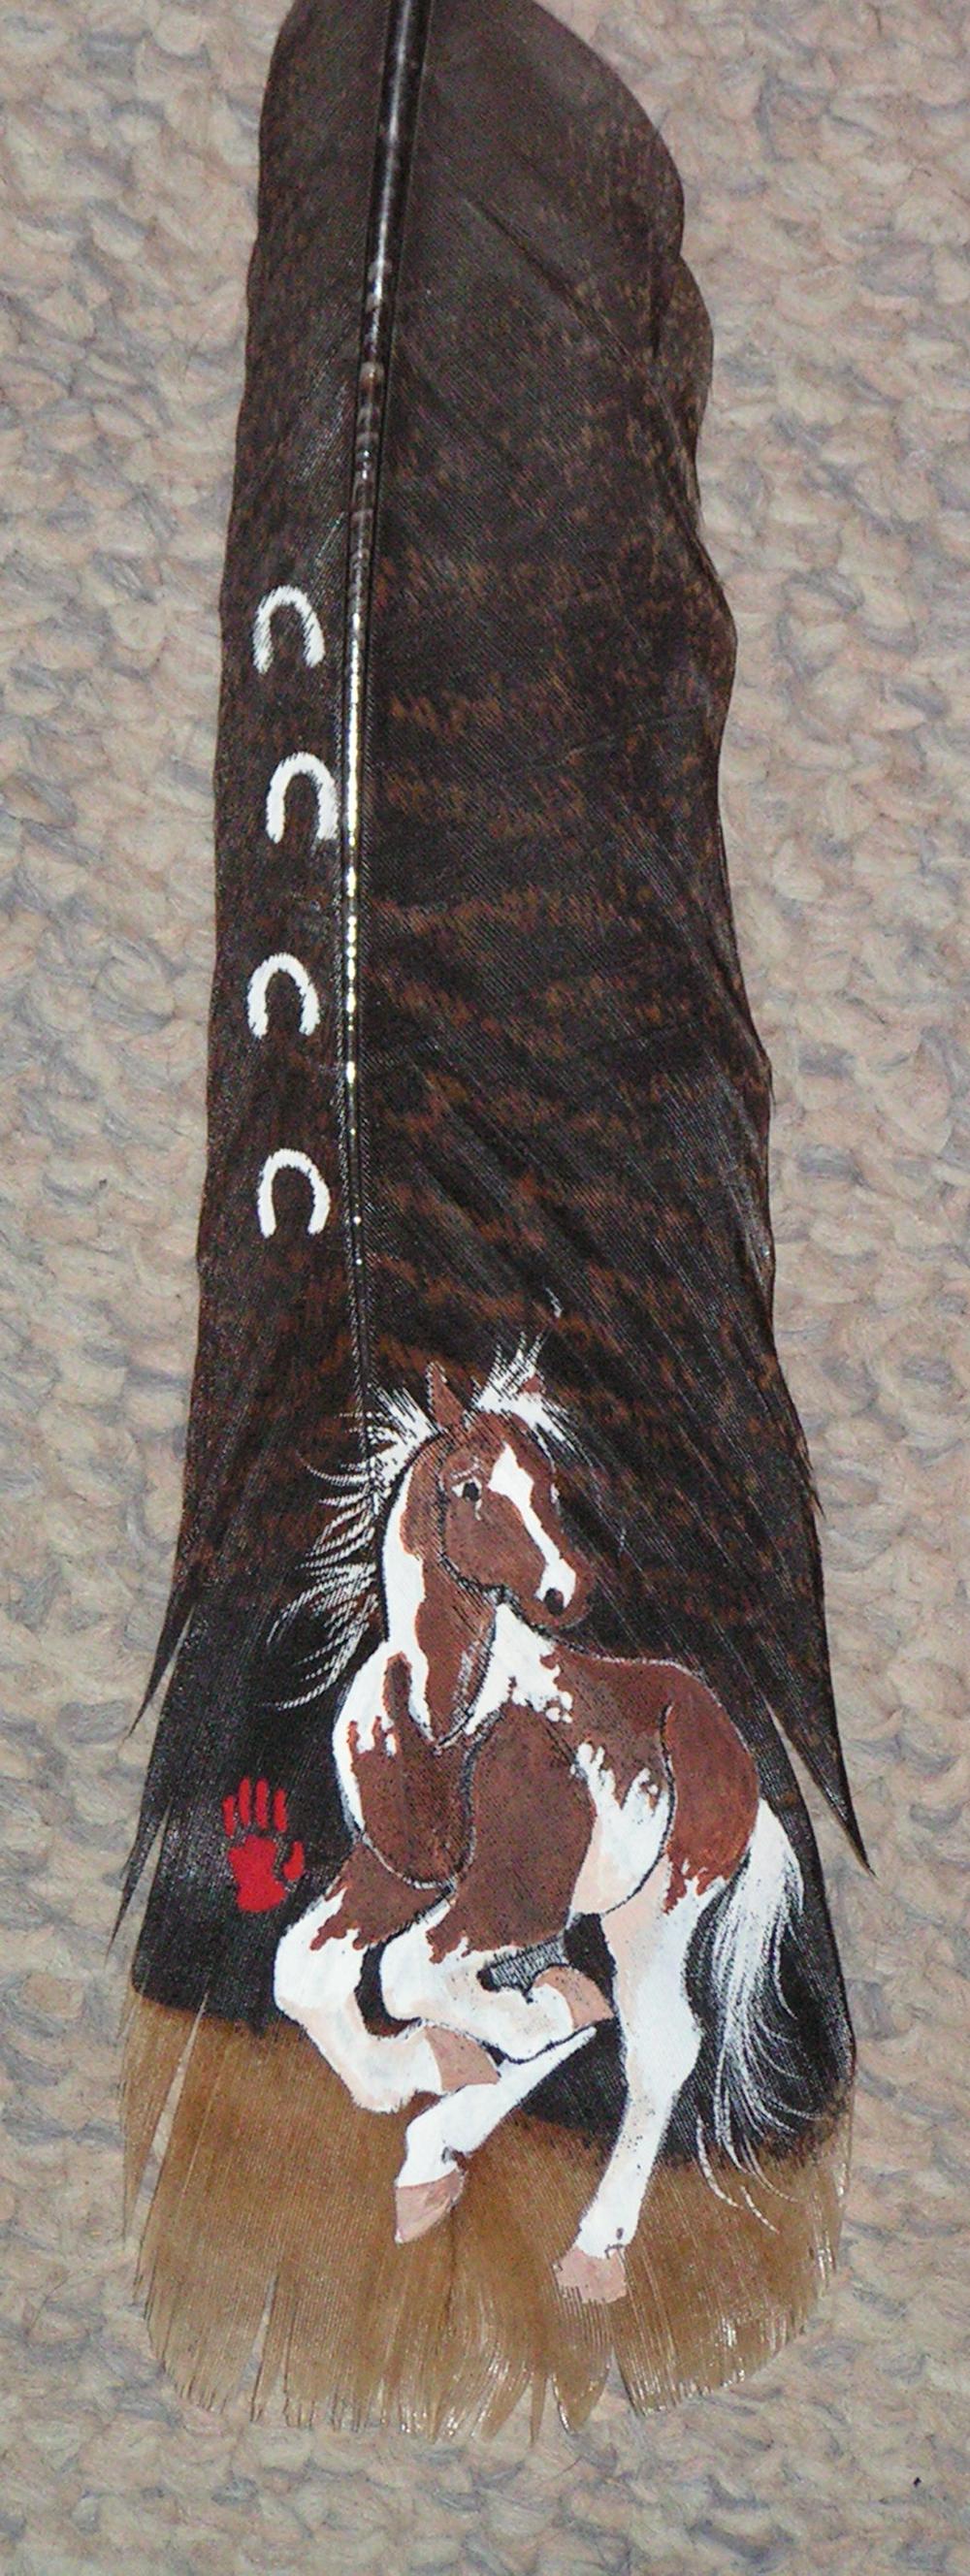 Double H ProduAcrylic on wild turkey feathers - Heather Honeywellctions - paint horse